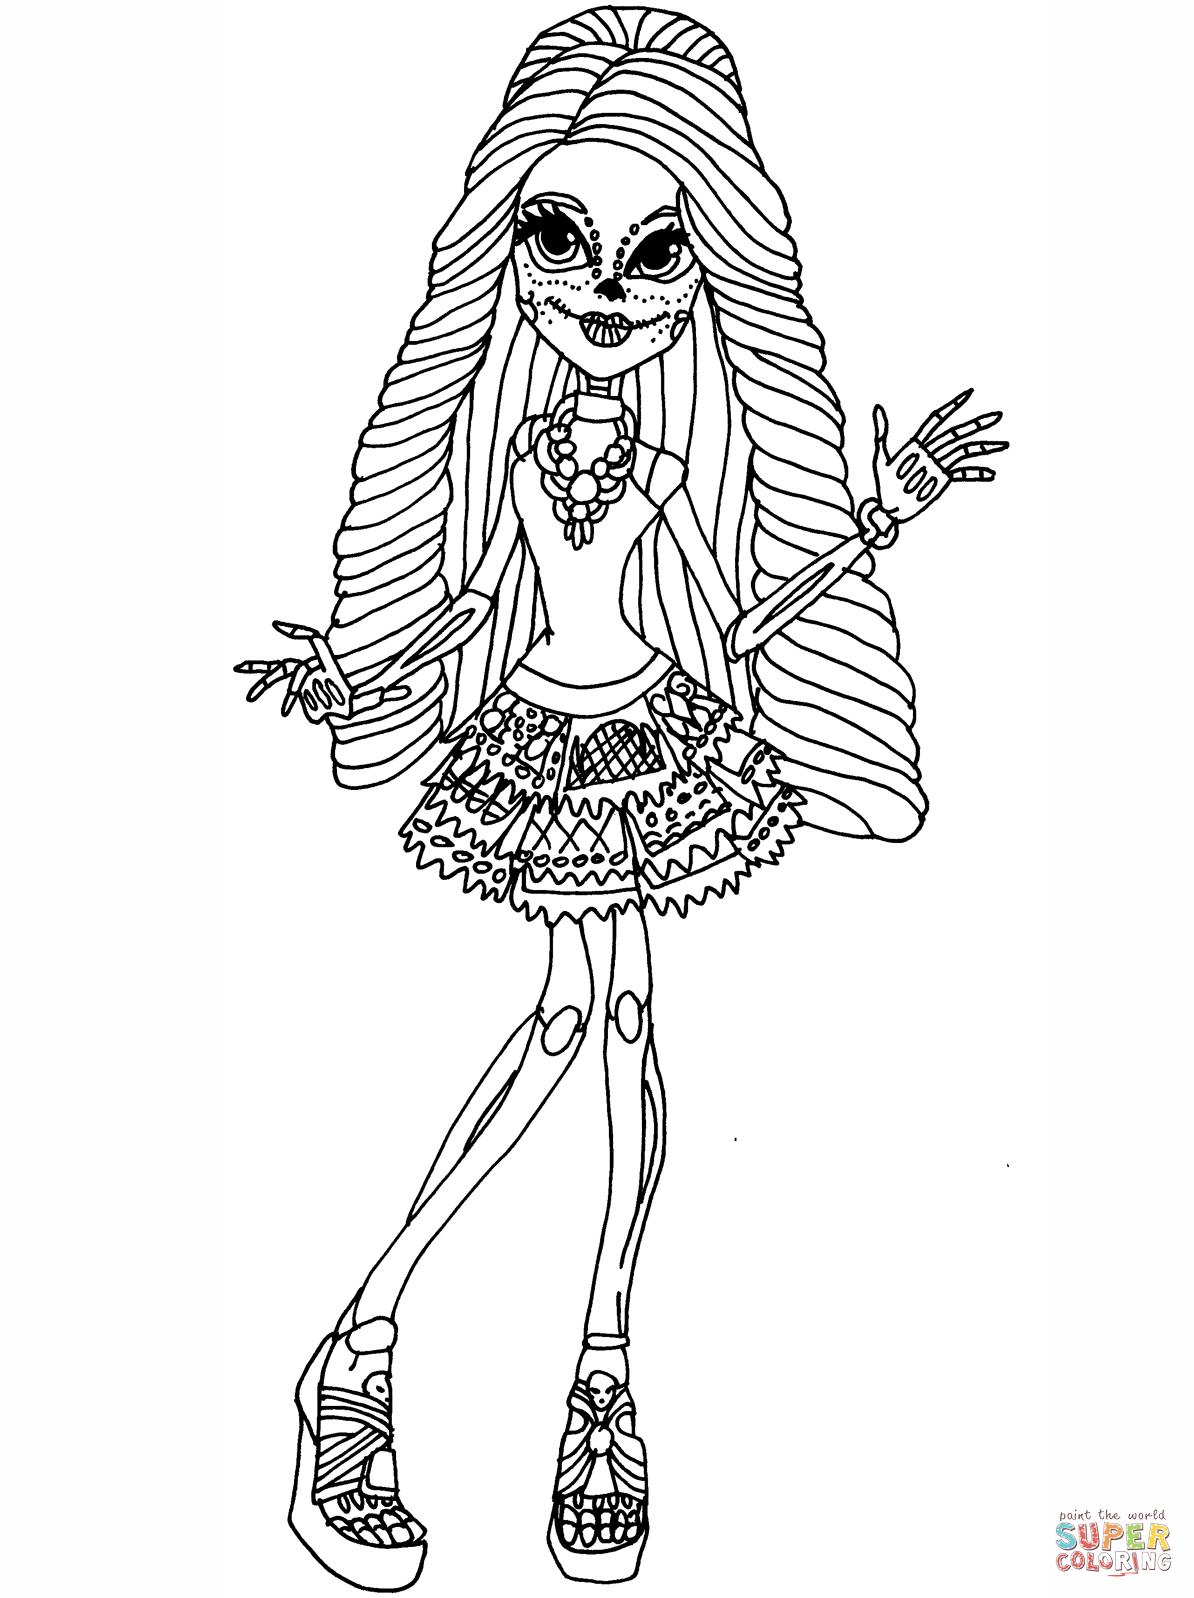 Monster High Ausmalbilder Skelita : Skelita Calaveras Coloring Page Png 1194 1598 Cata Pinterest